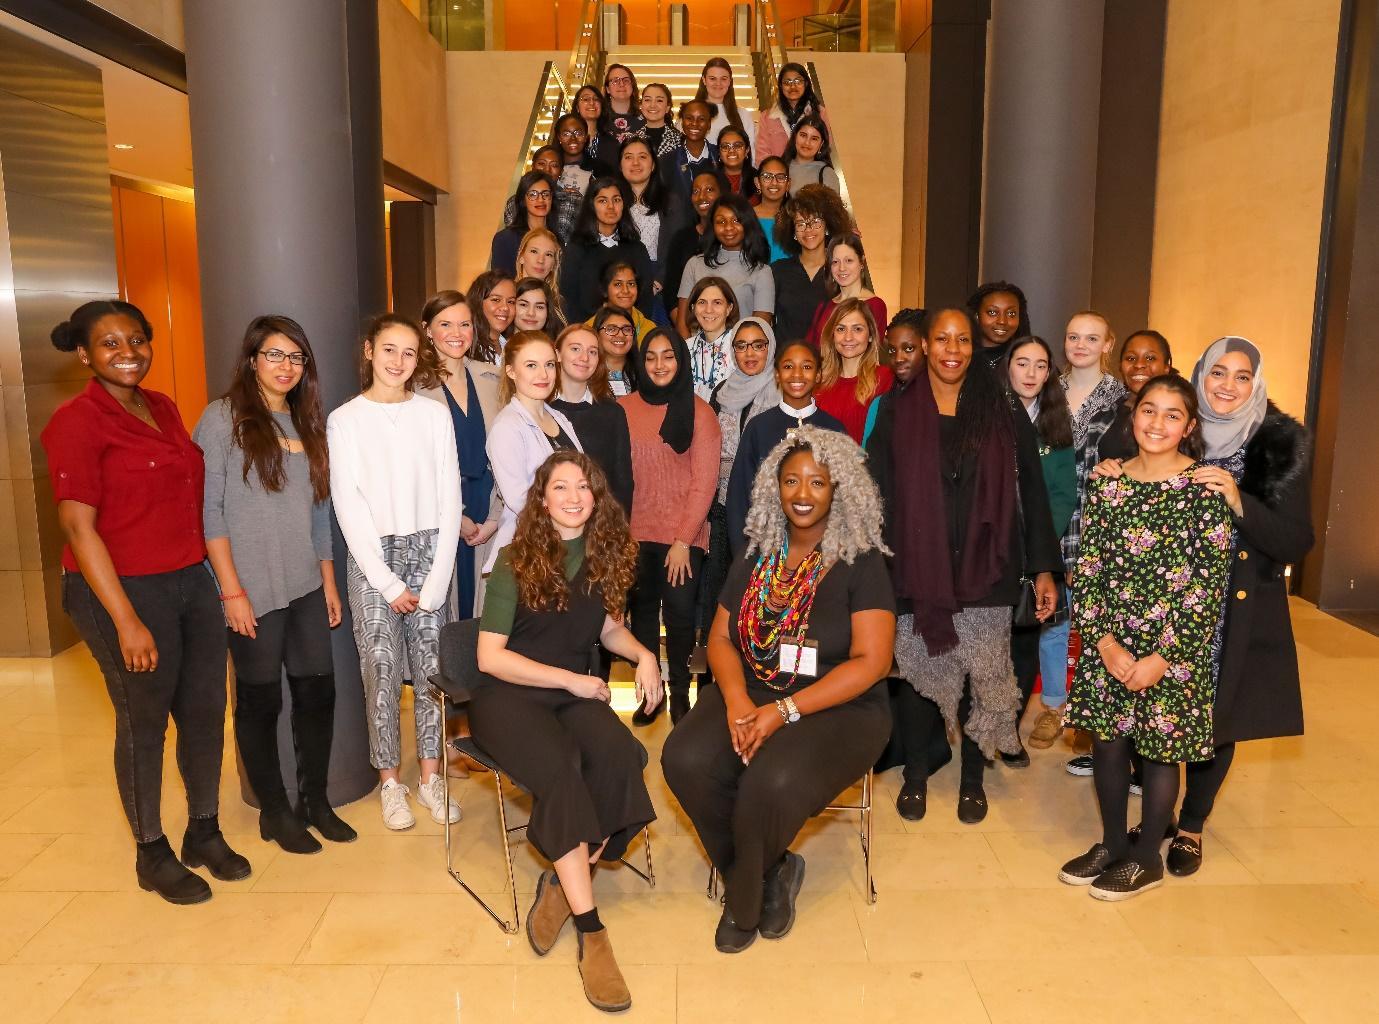 Students to STEMettes London Graduation 2019